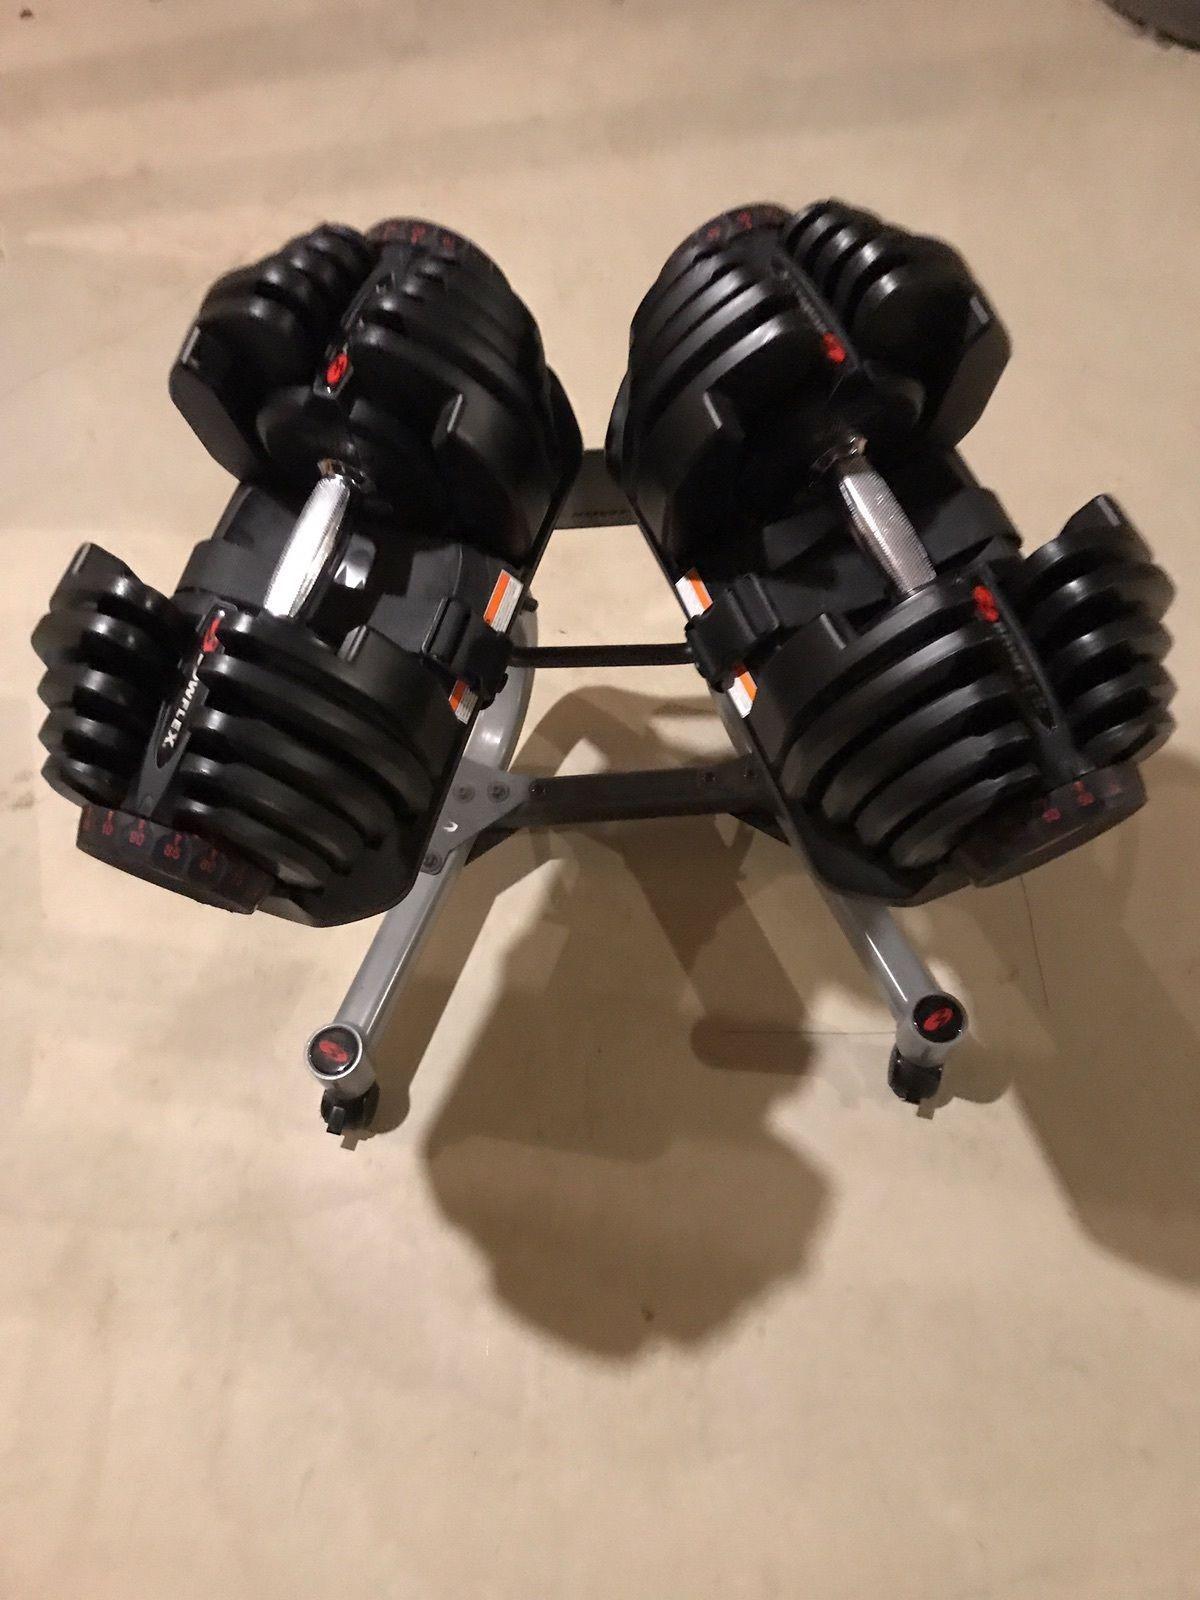 Bowflex 1090 Dumbbells Selecttech Pair And Stand 90lbs Per Dumbbell Work Out Wear Bowflex Dumbbells Dumbbell